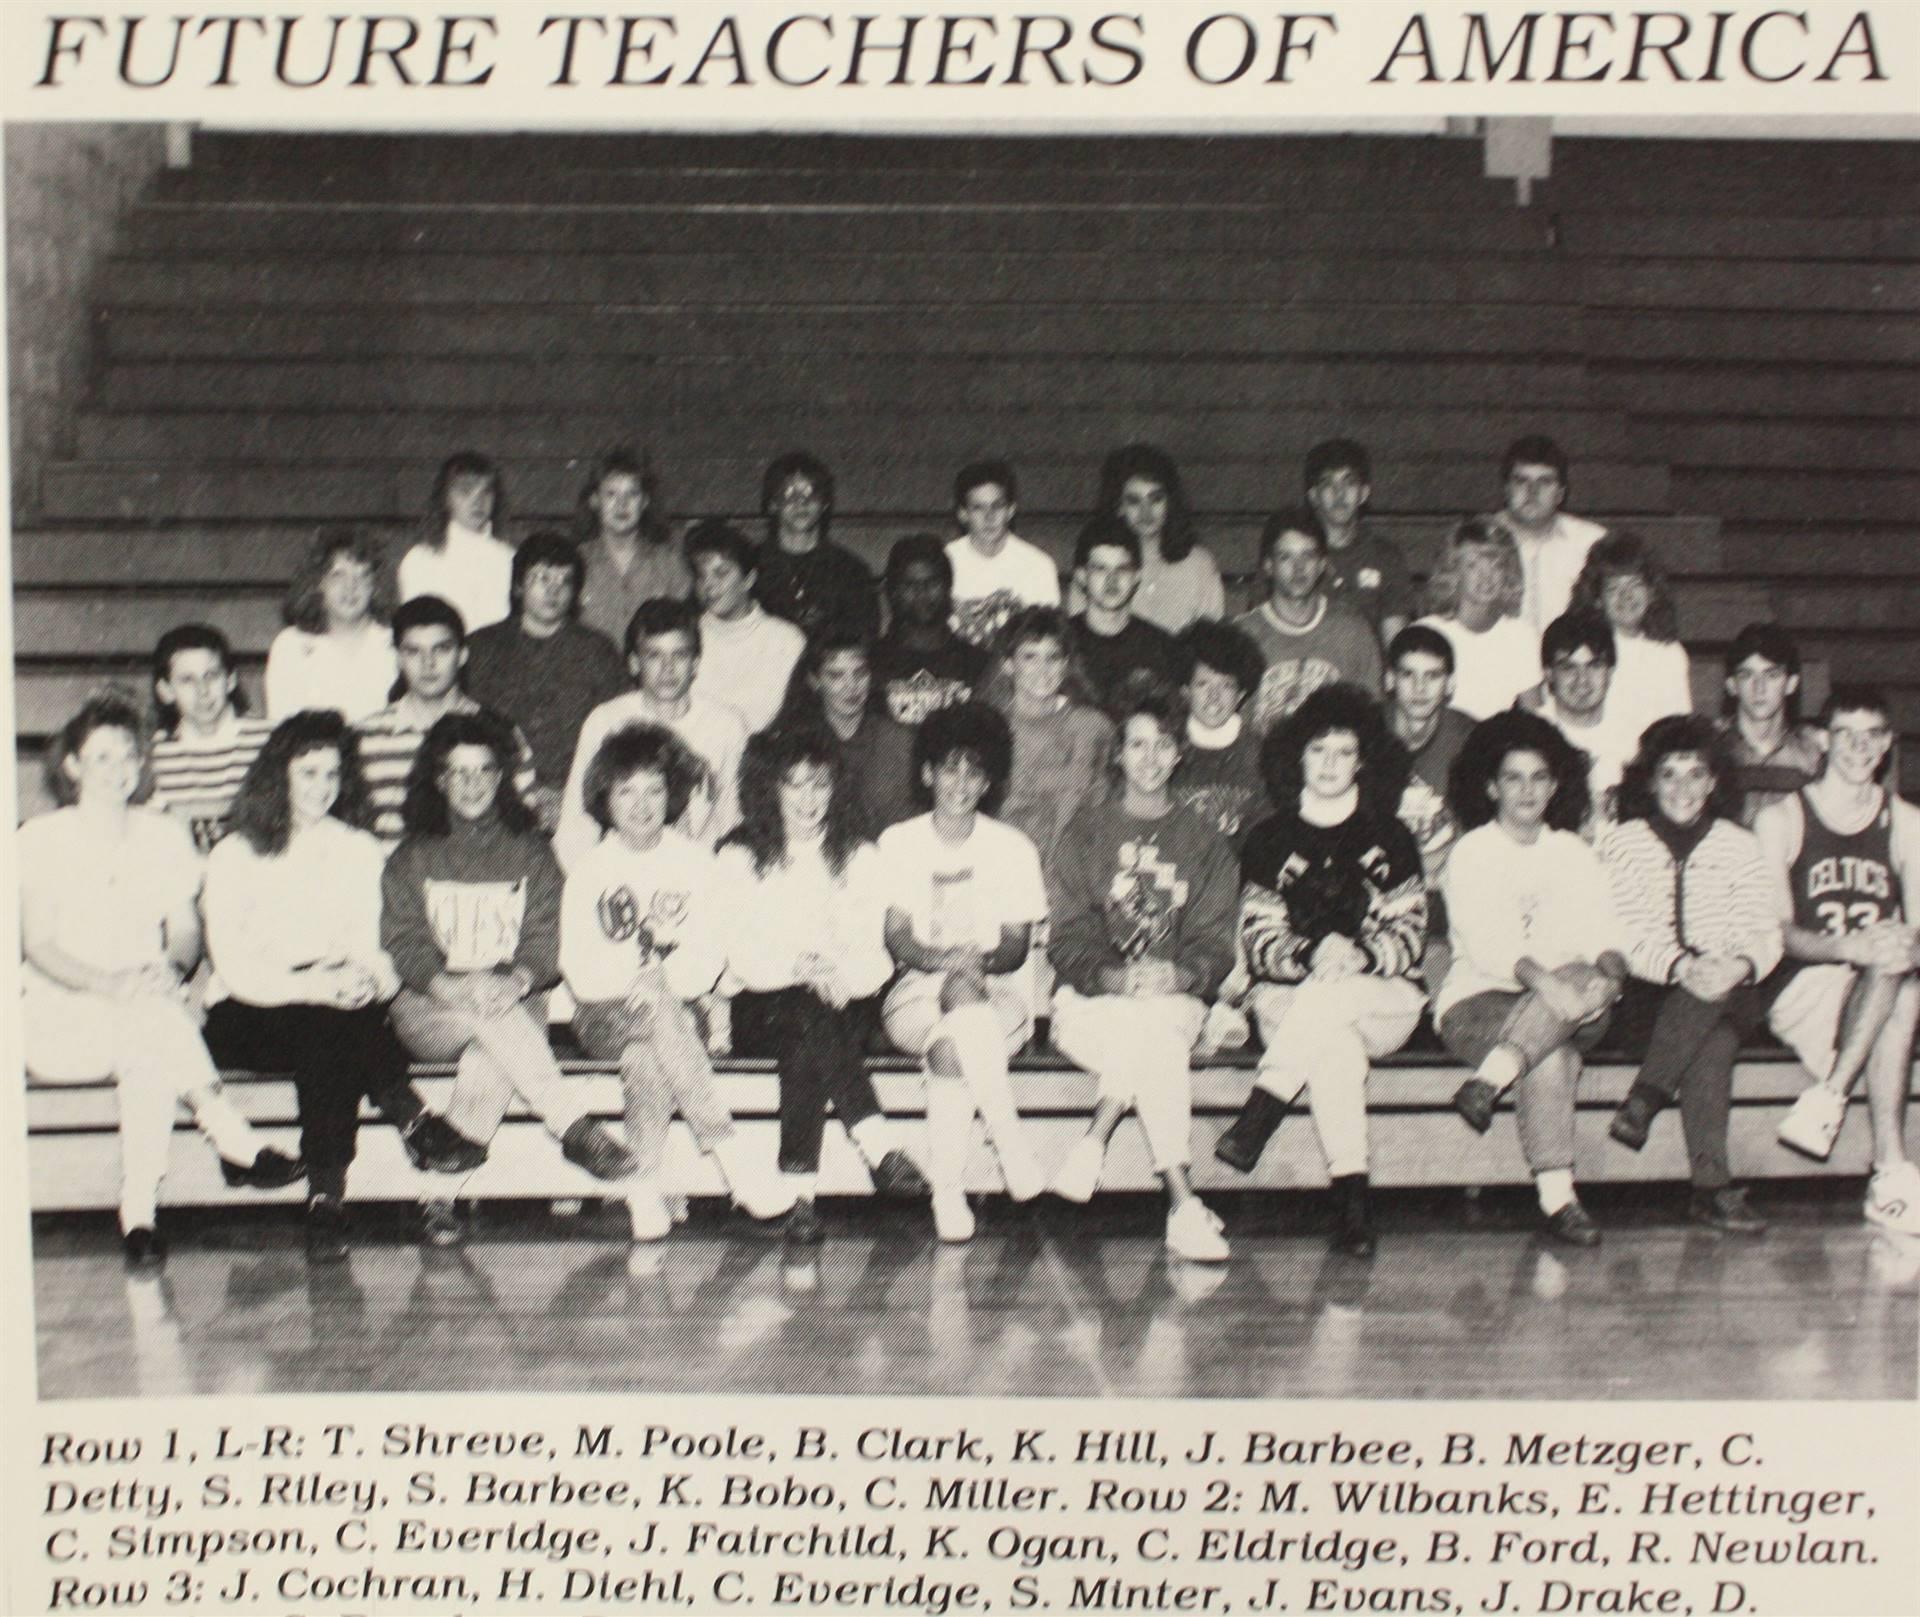 1990 Future Teachers of America